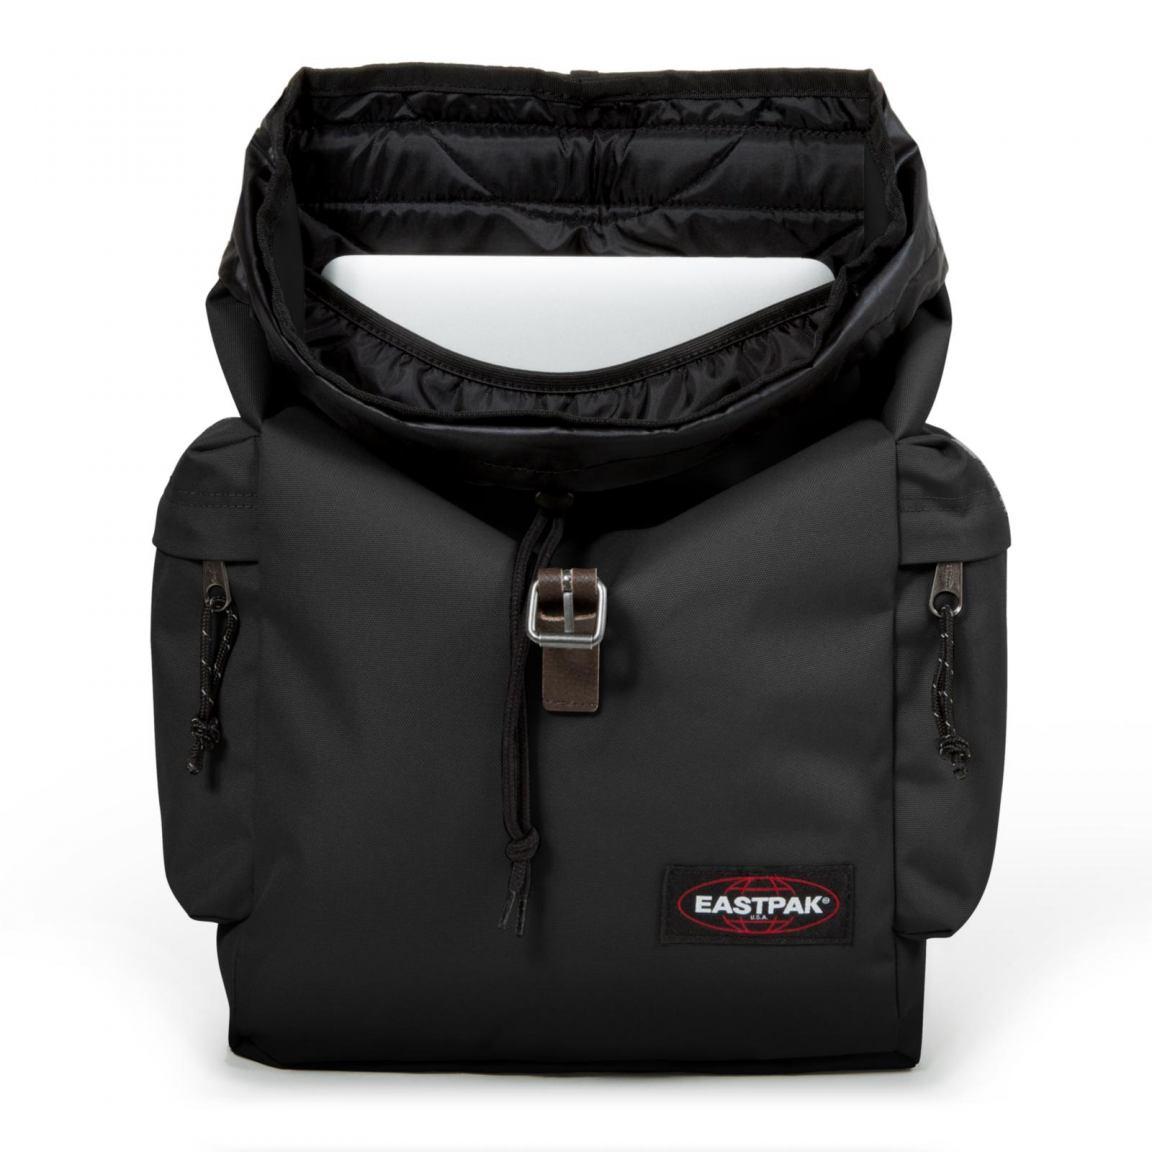 Eastpak Austin Laptoprucksack Black